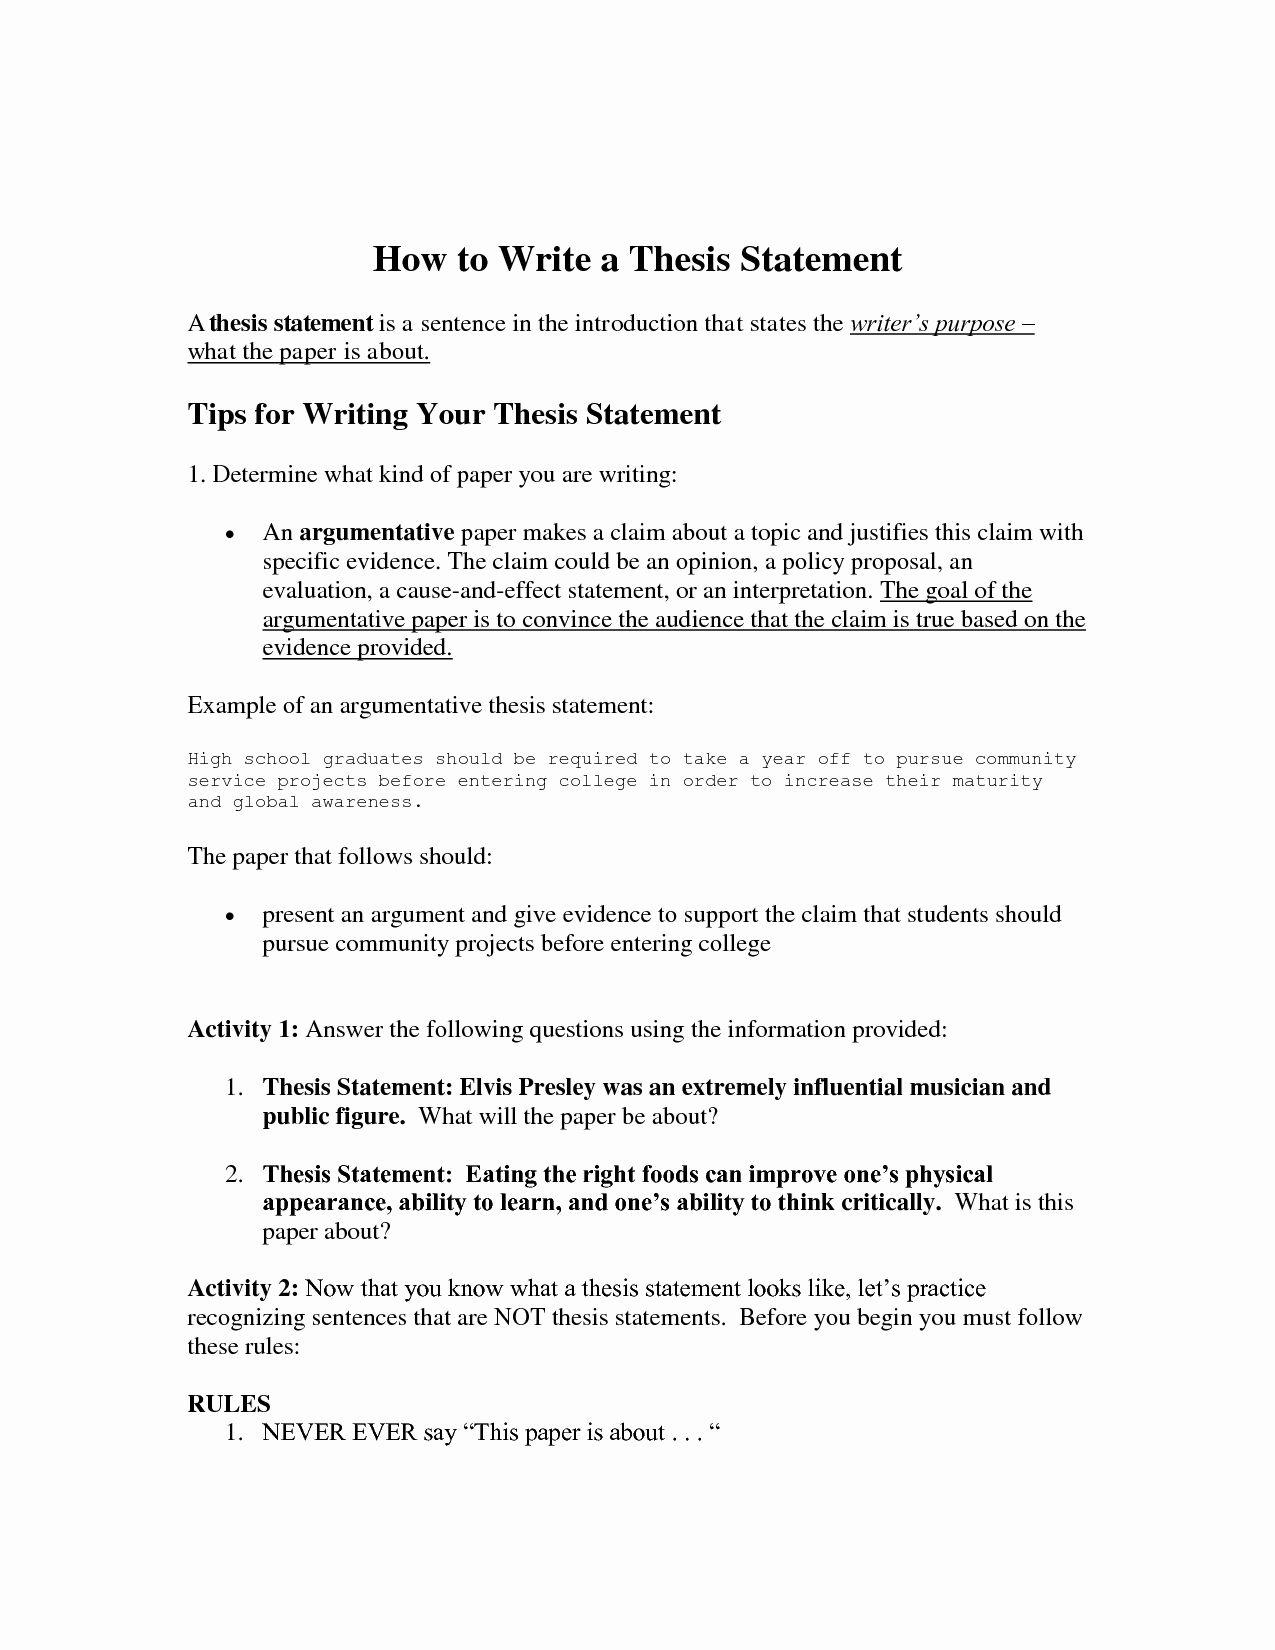 Thesis Statement Practice Worksheet Elegant 39 Examples Of